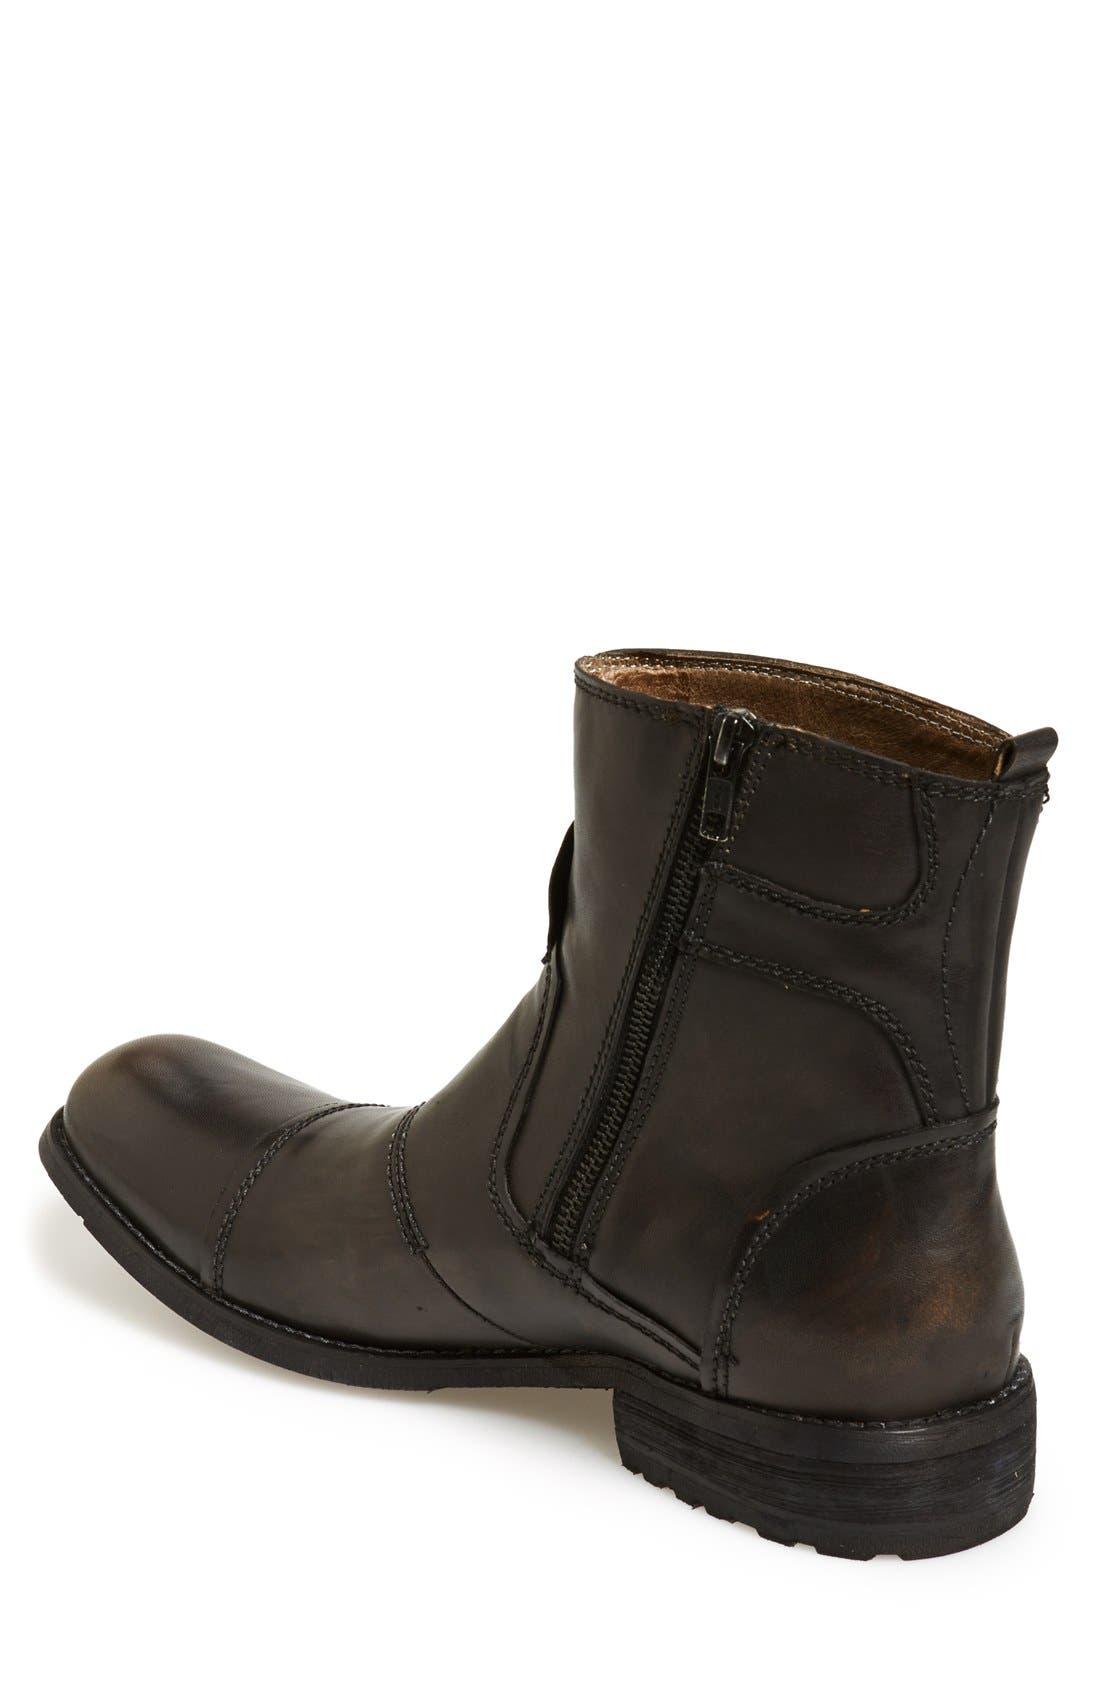 Alternate Image 2  - Bed Stu 'Burst' Boot (Online Only) (Men)